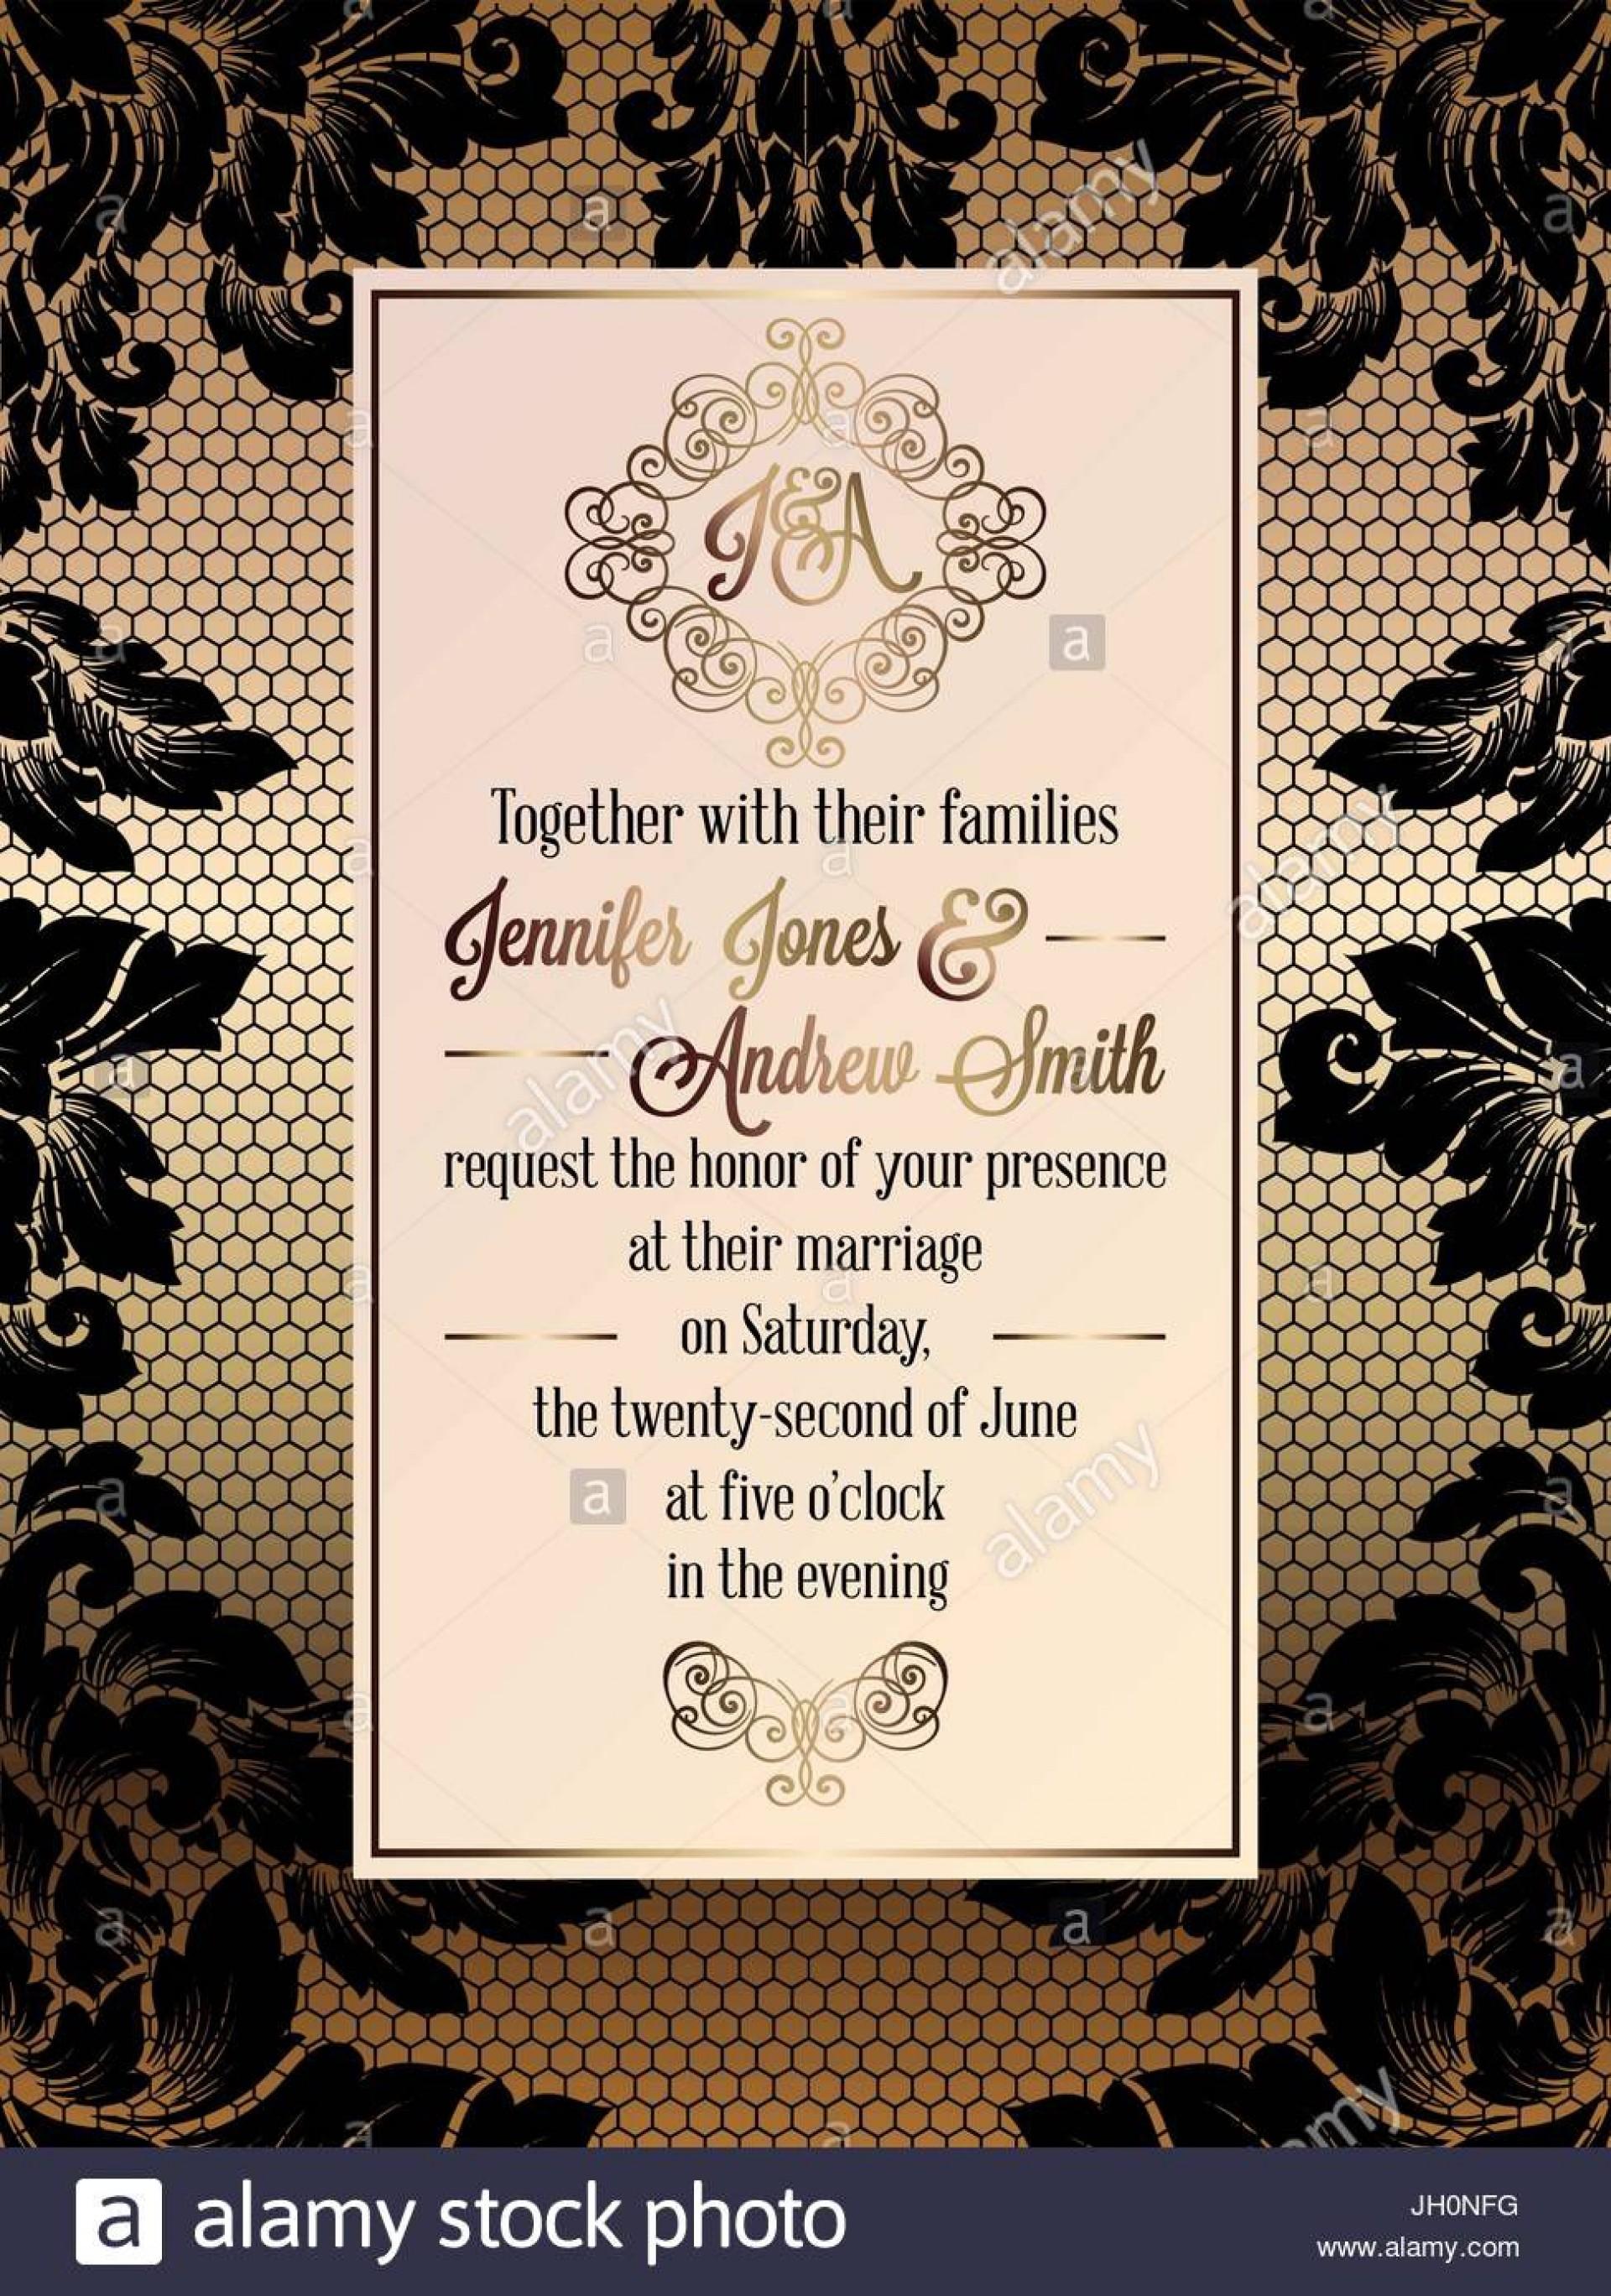 008 Impressive Elegant Wedding Menu Card Template Highest Quality  Templates1920